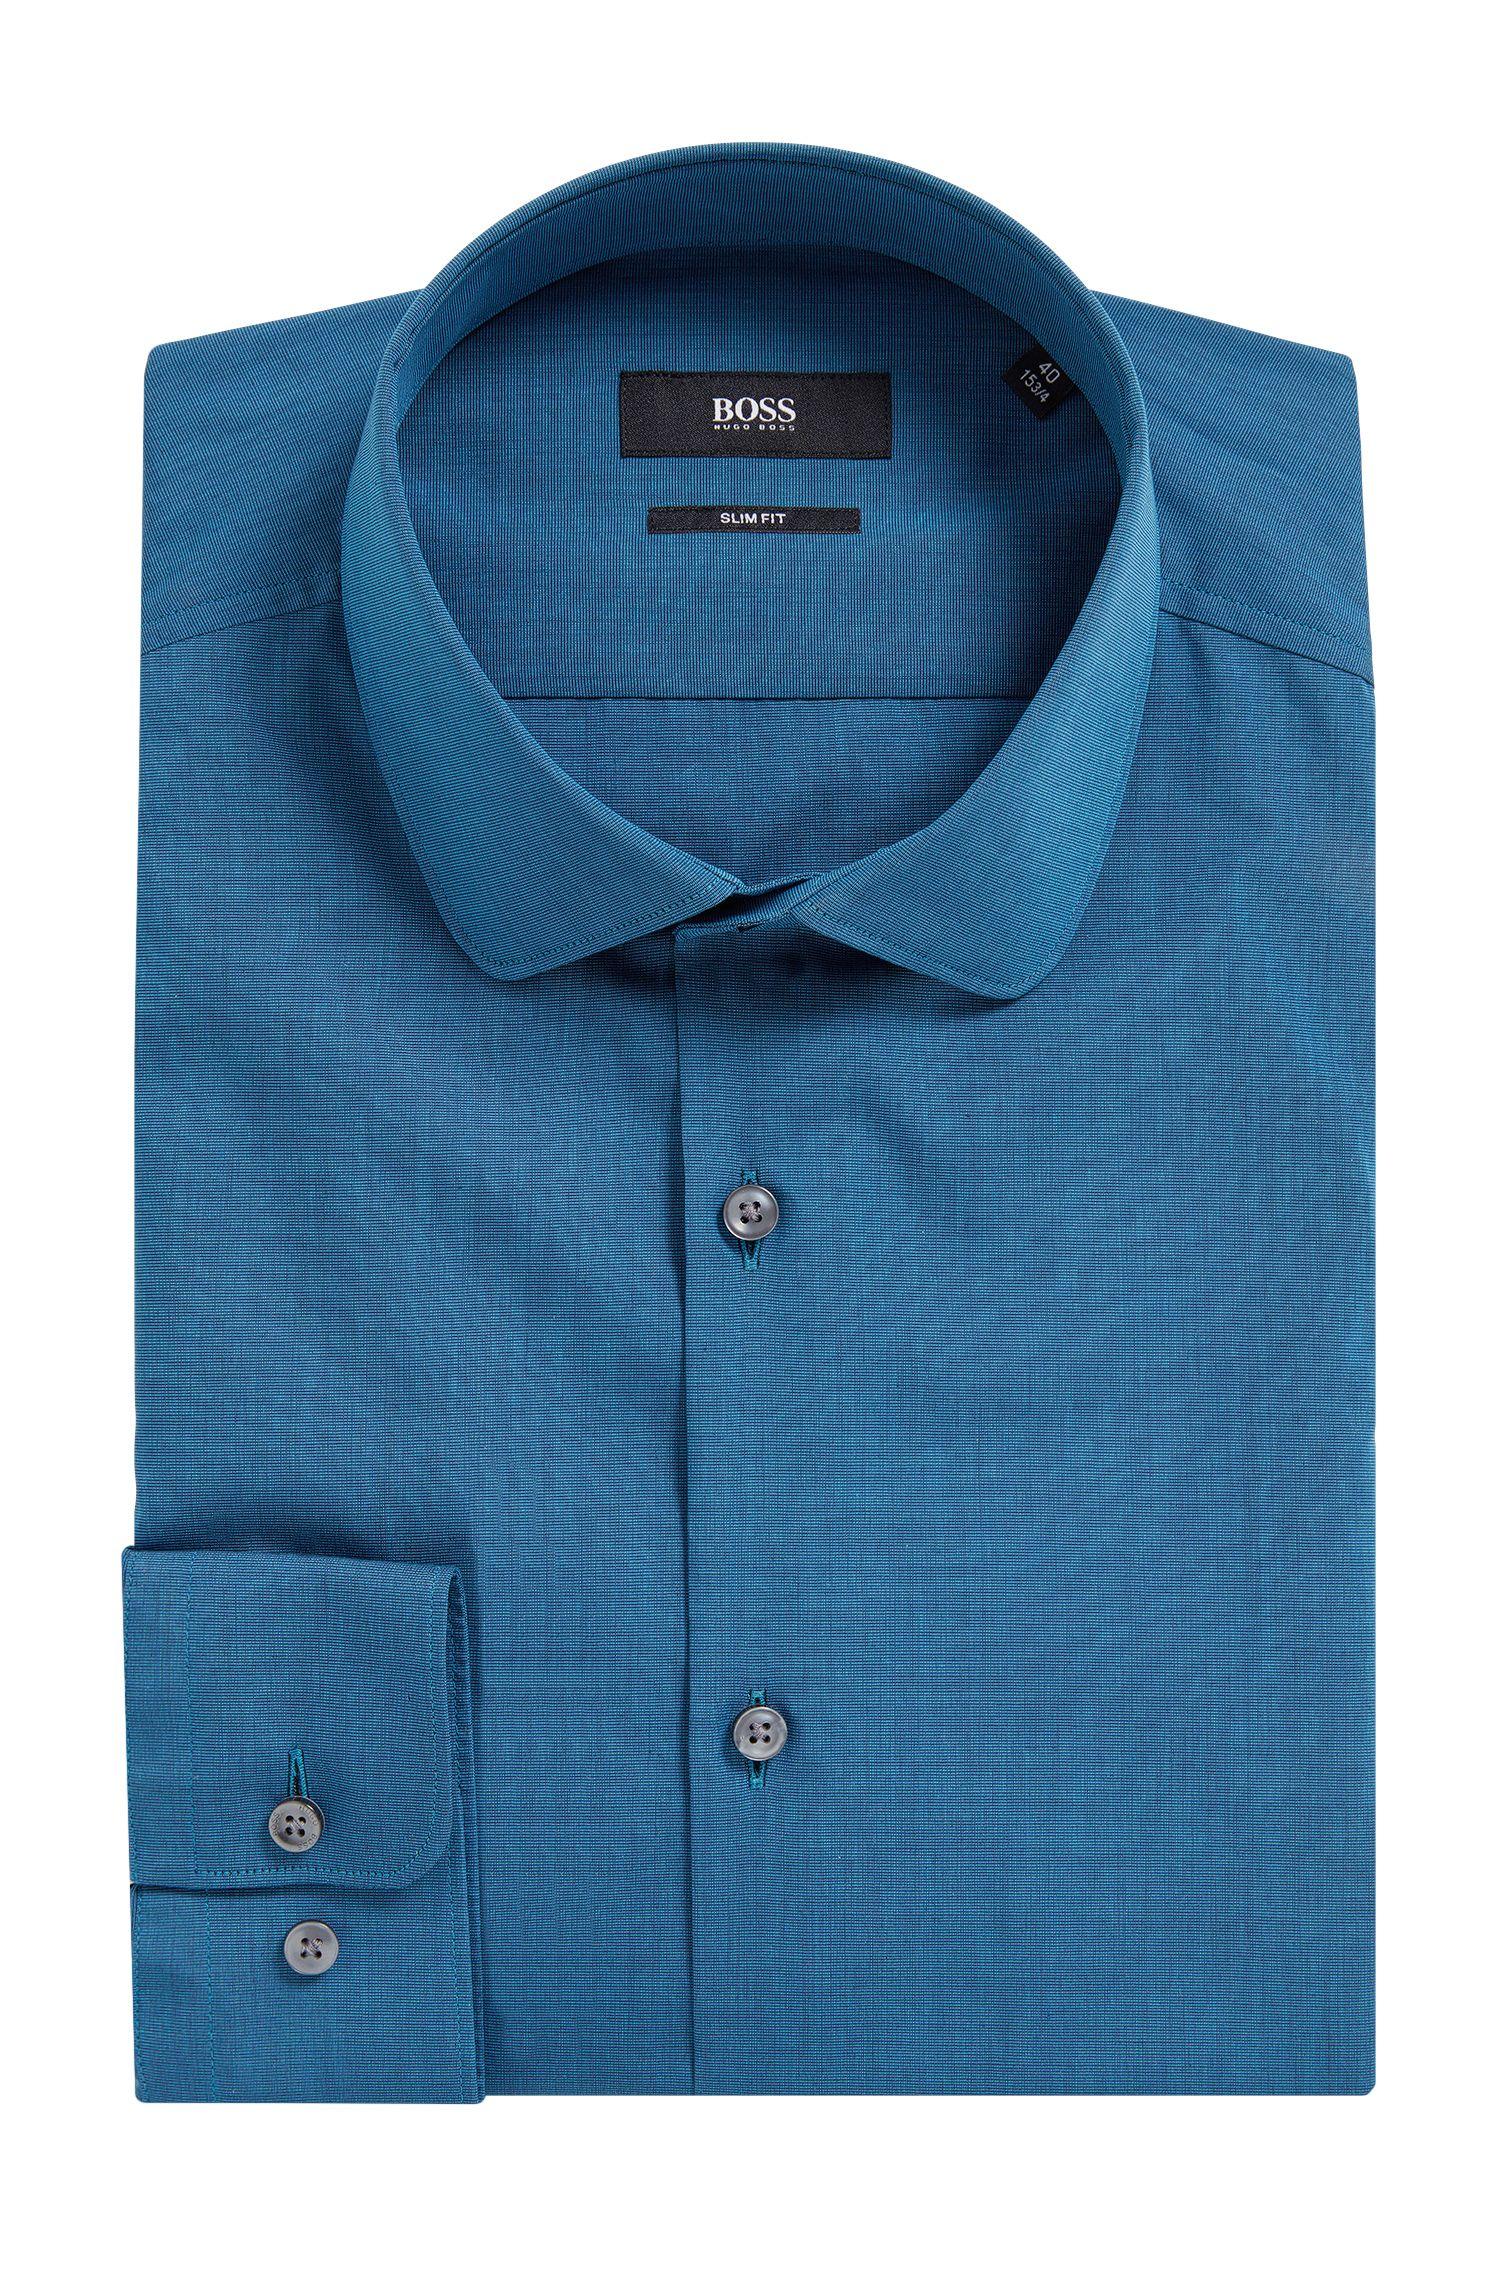 Cotton Poplin Dress Shirt, Slim Fit | Joshua, Turquoise